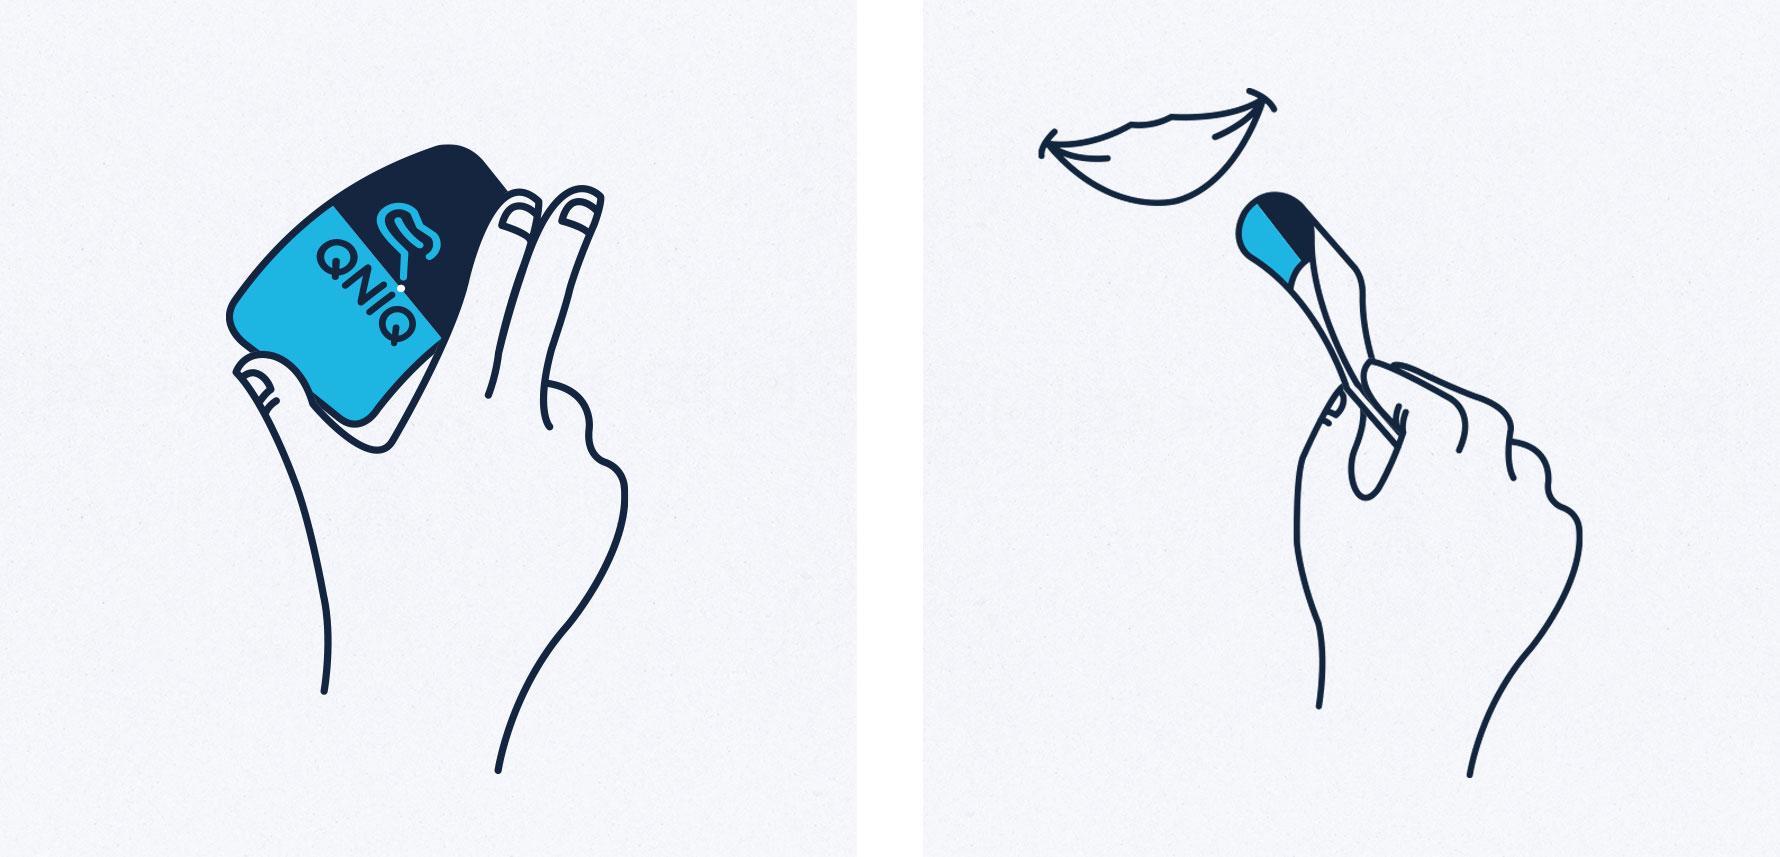 Hüfner Design | Referenz QNIQ | Illustration